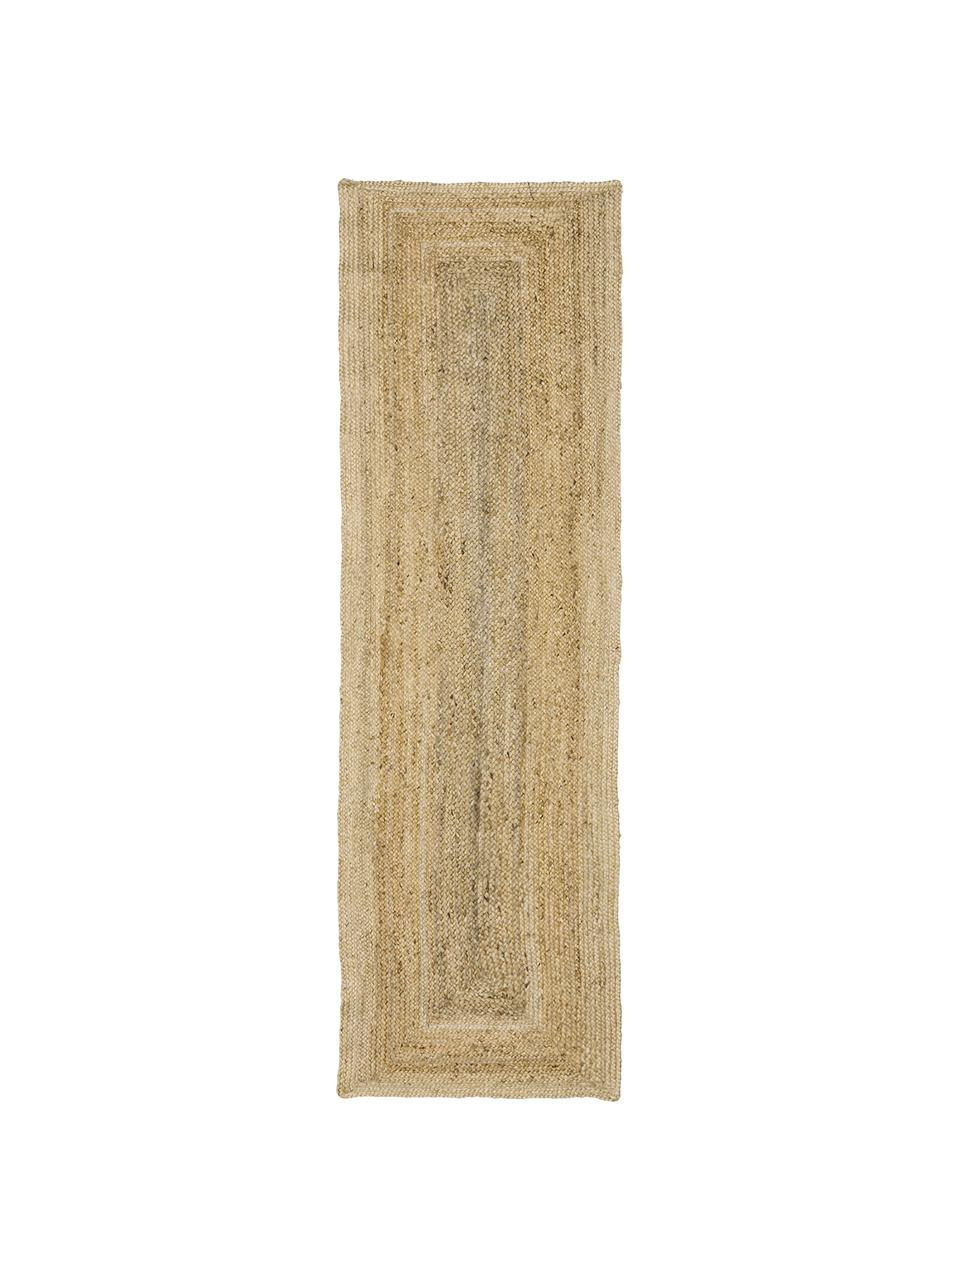 Handgemaakte juten loper Sharmila, 100% jute, Beige, 80 x 250 cm